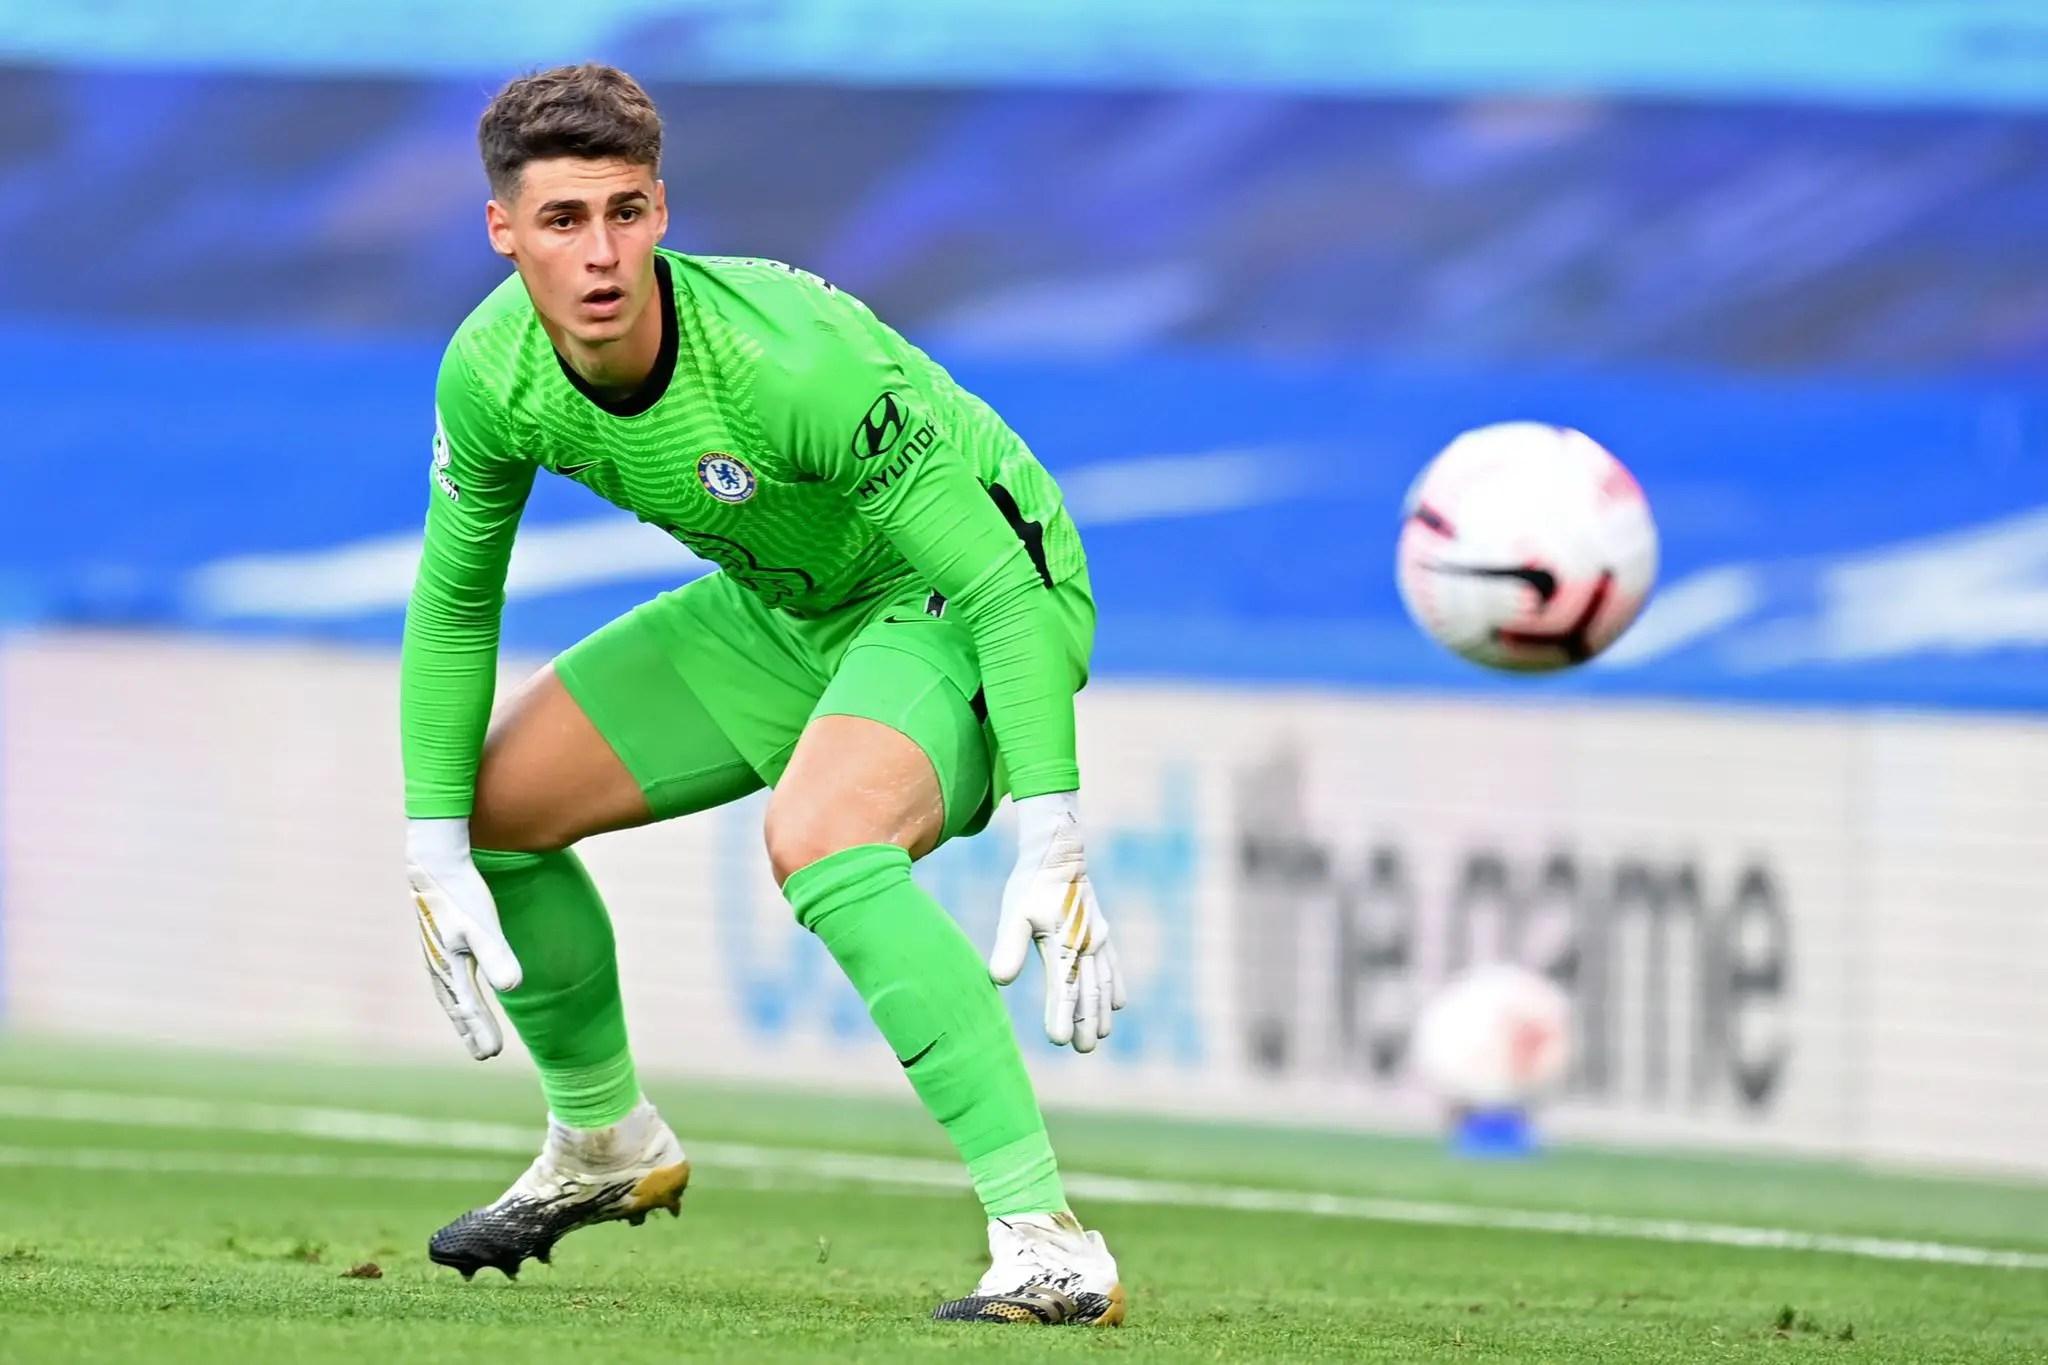 Kepa Will Be In Goal In FA Cup Final -Tuchel